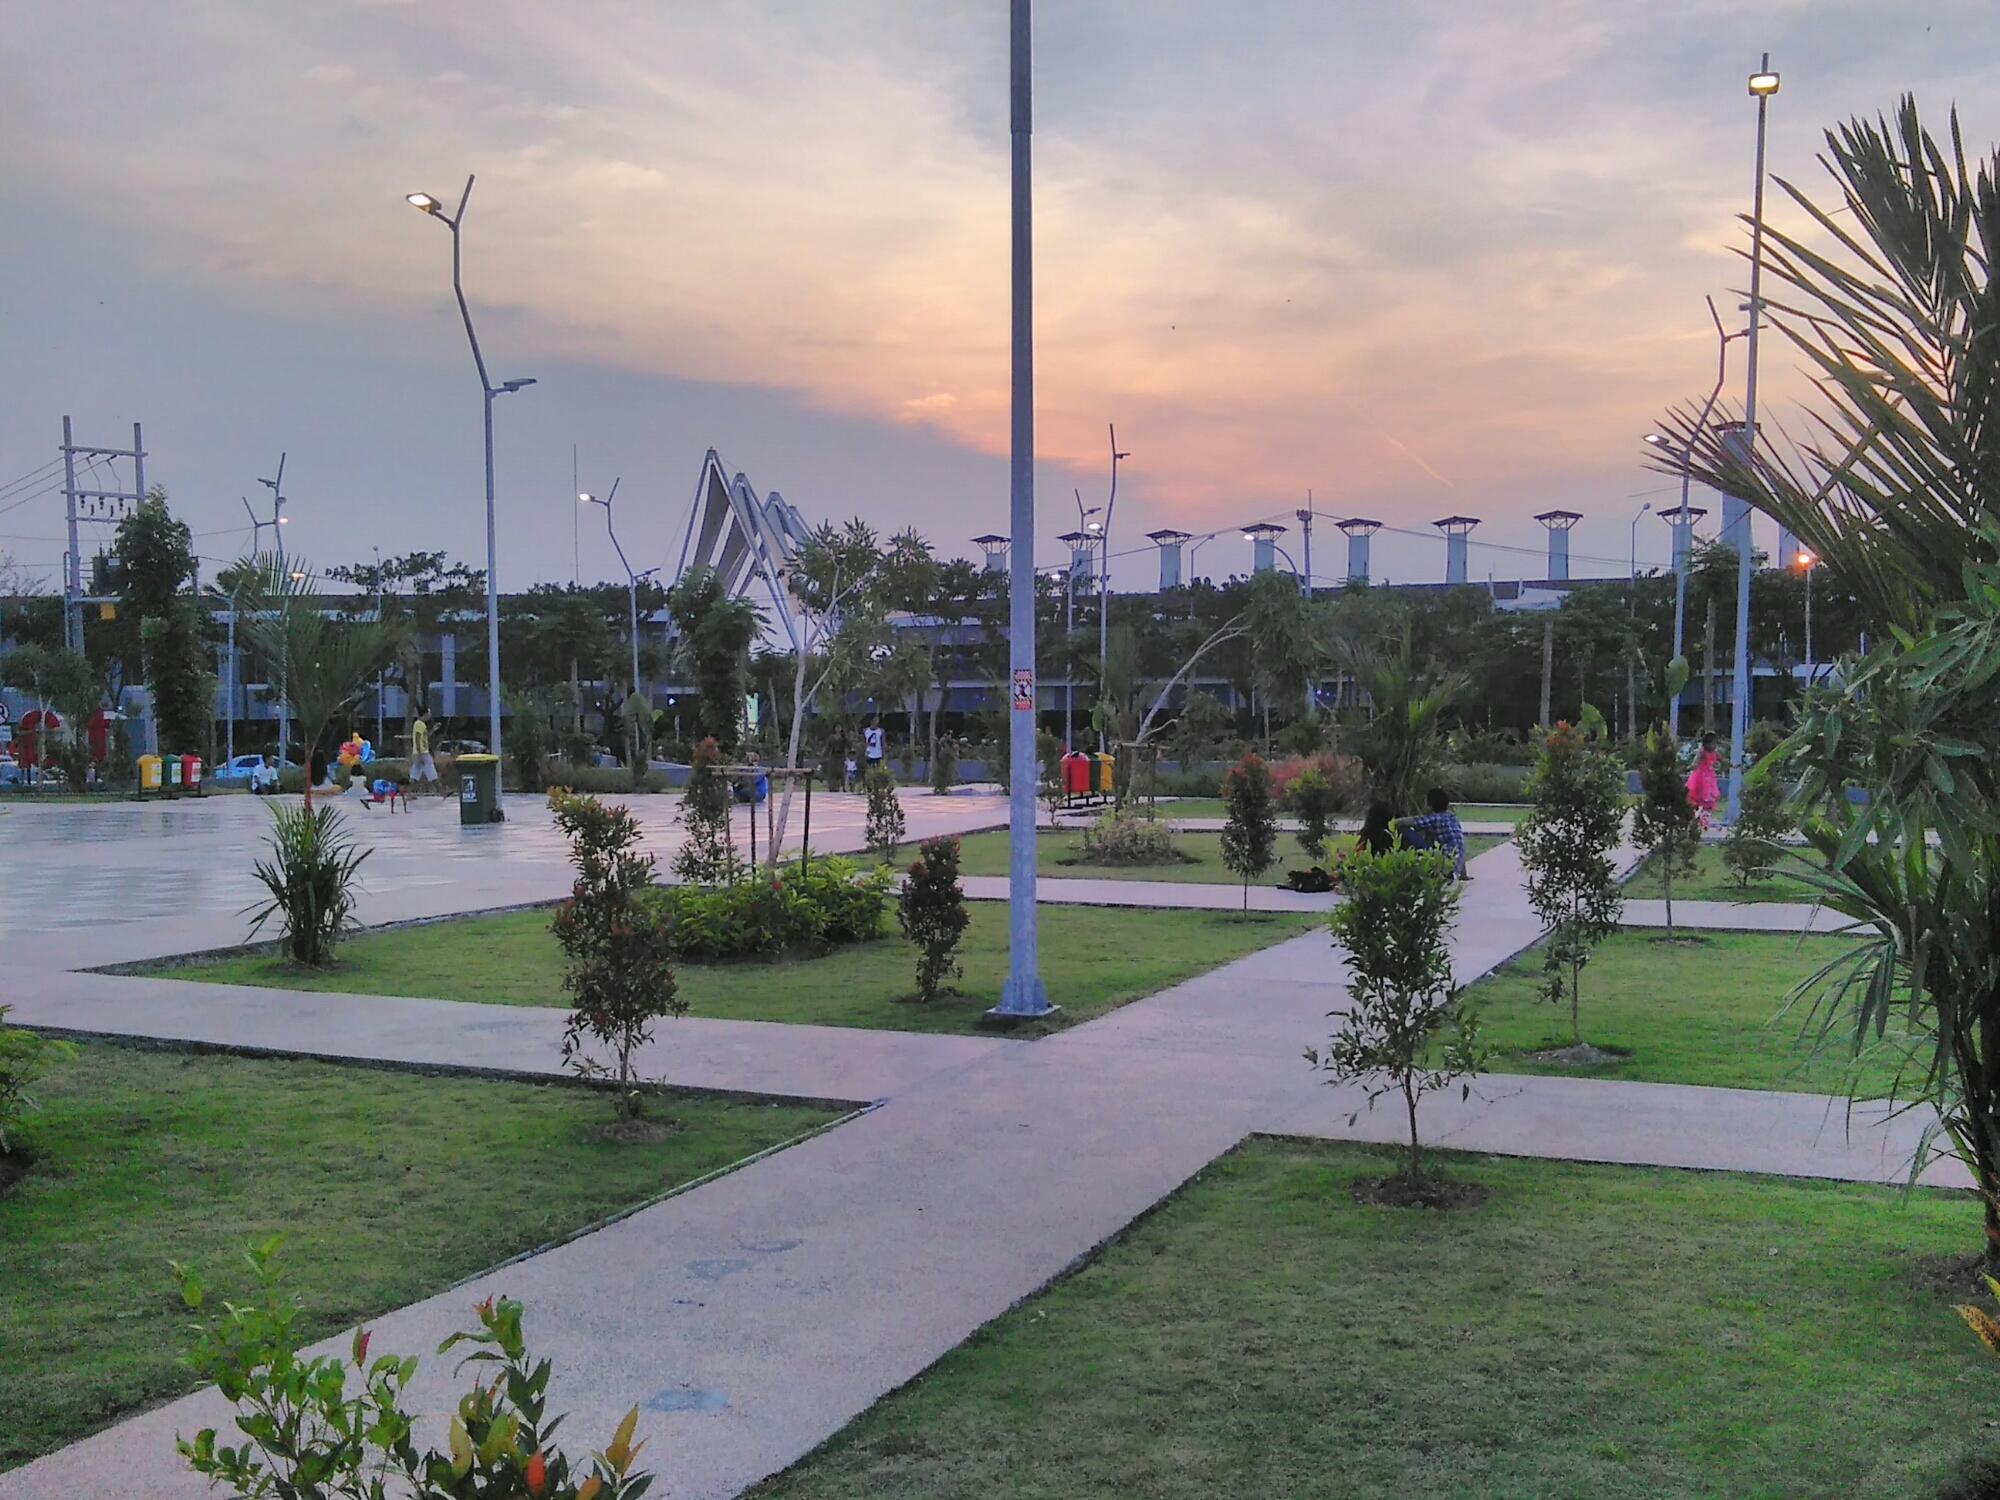 Taman Suroboyo Pesona Kota Surabaya Berada Dalamnya Merasa Inilah Satu